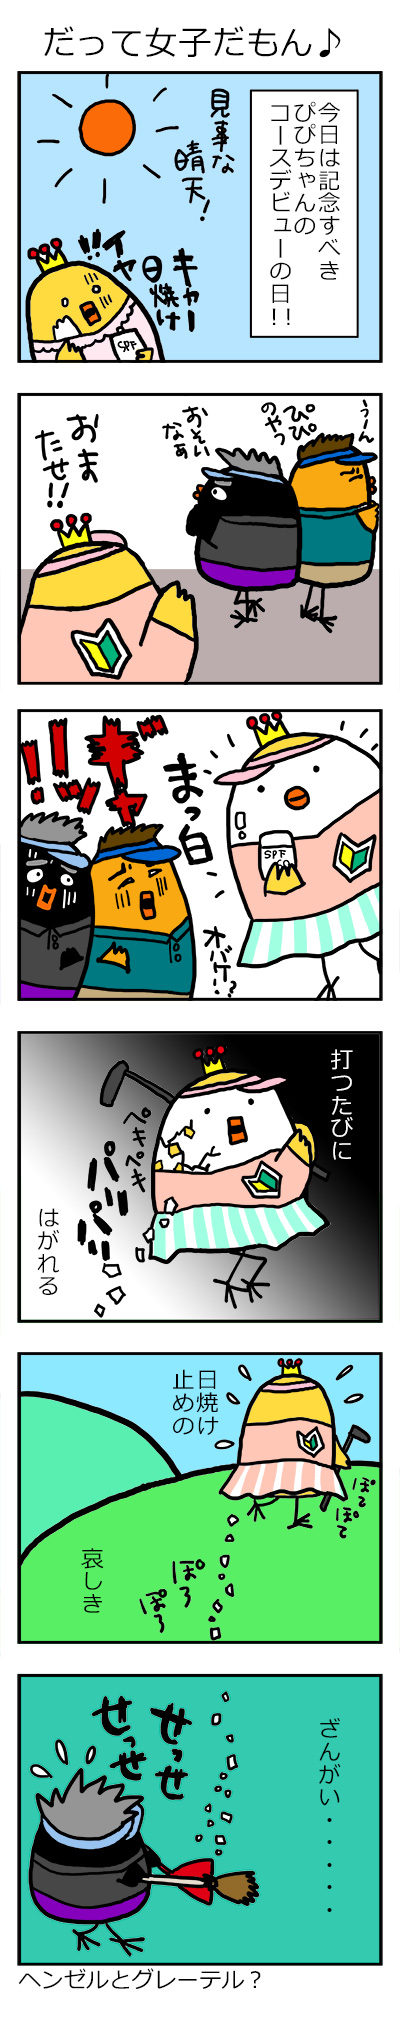 09_hina1a.jpg